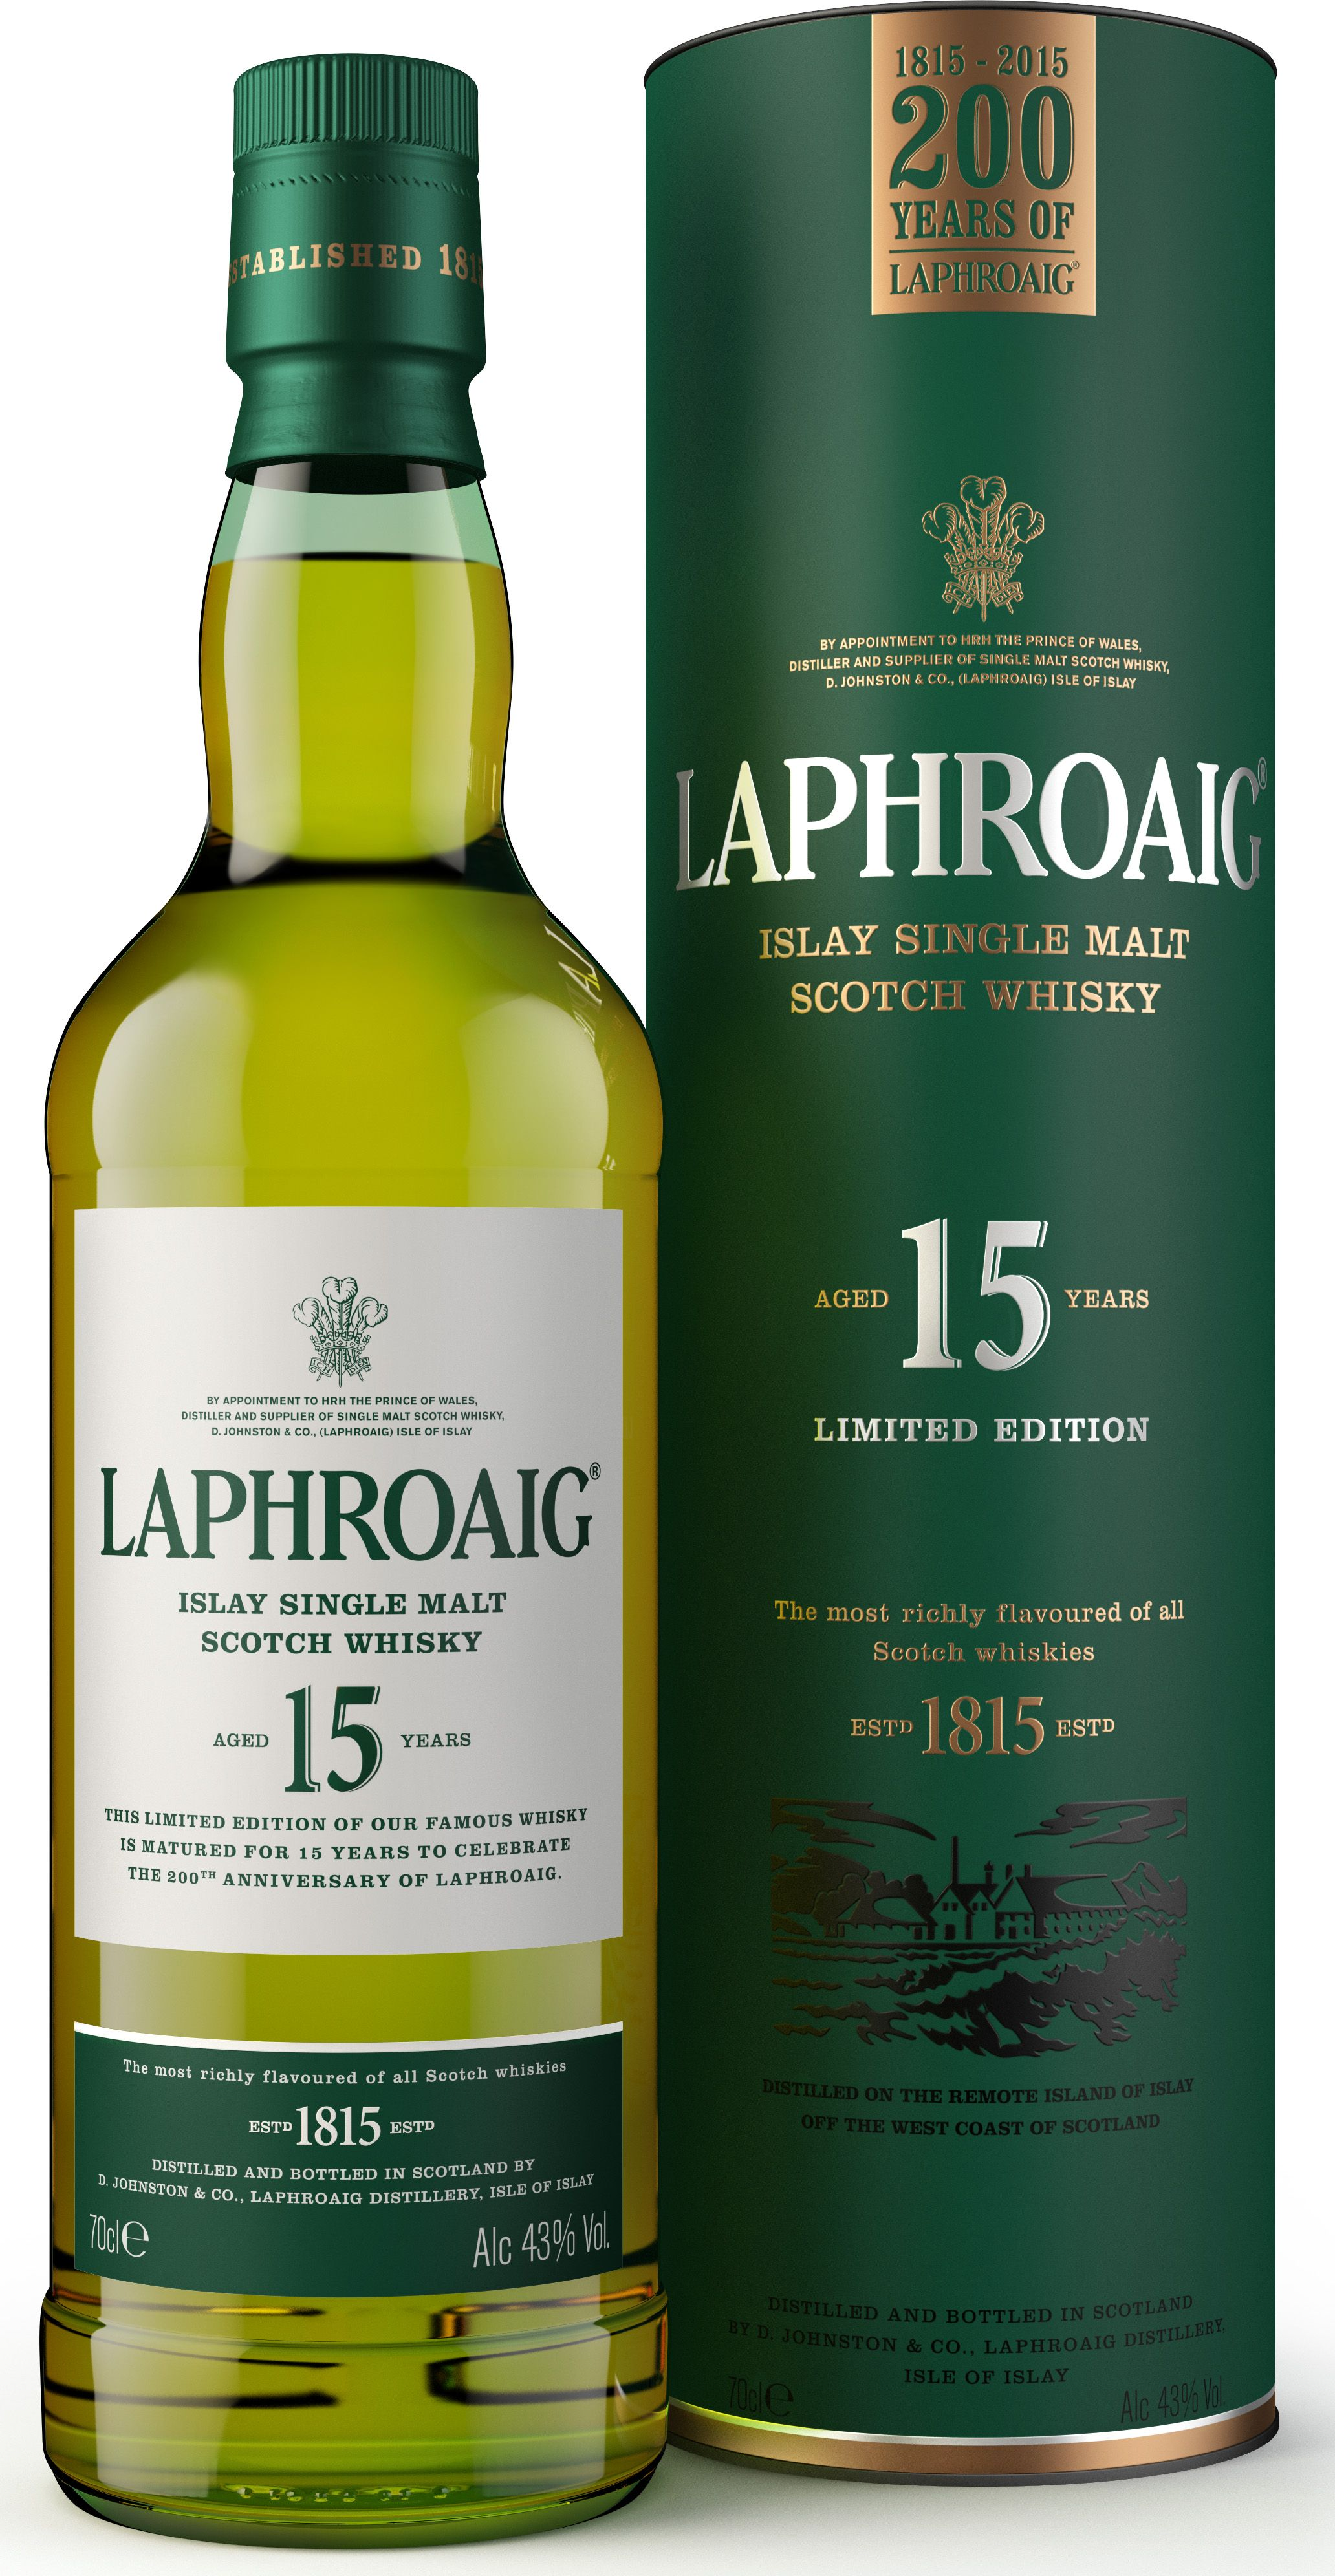 Laphroaig 200 Years Of Laphroaig 15 Jahre Whisky Online Kaufen Im Whisky Shop Bei Whiskyzone Alkohol Spirituosen Schnaps